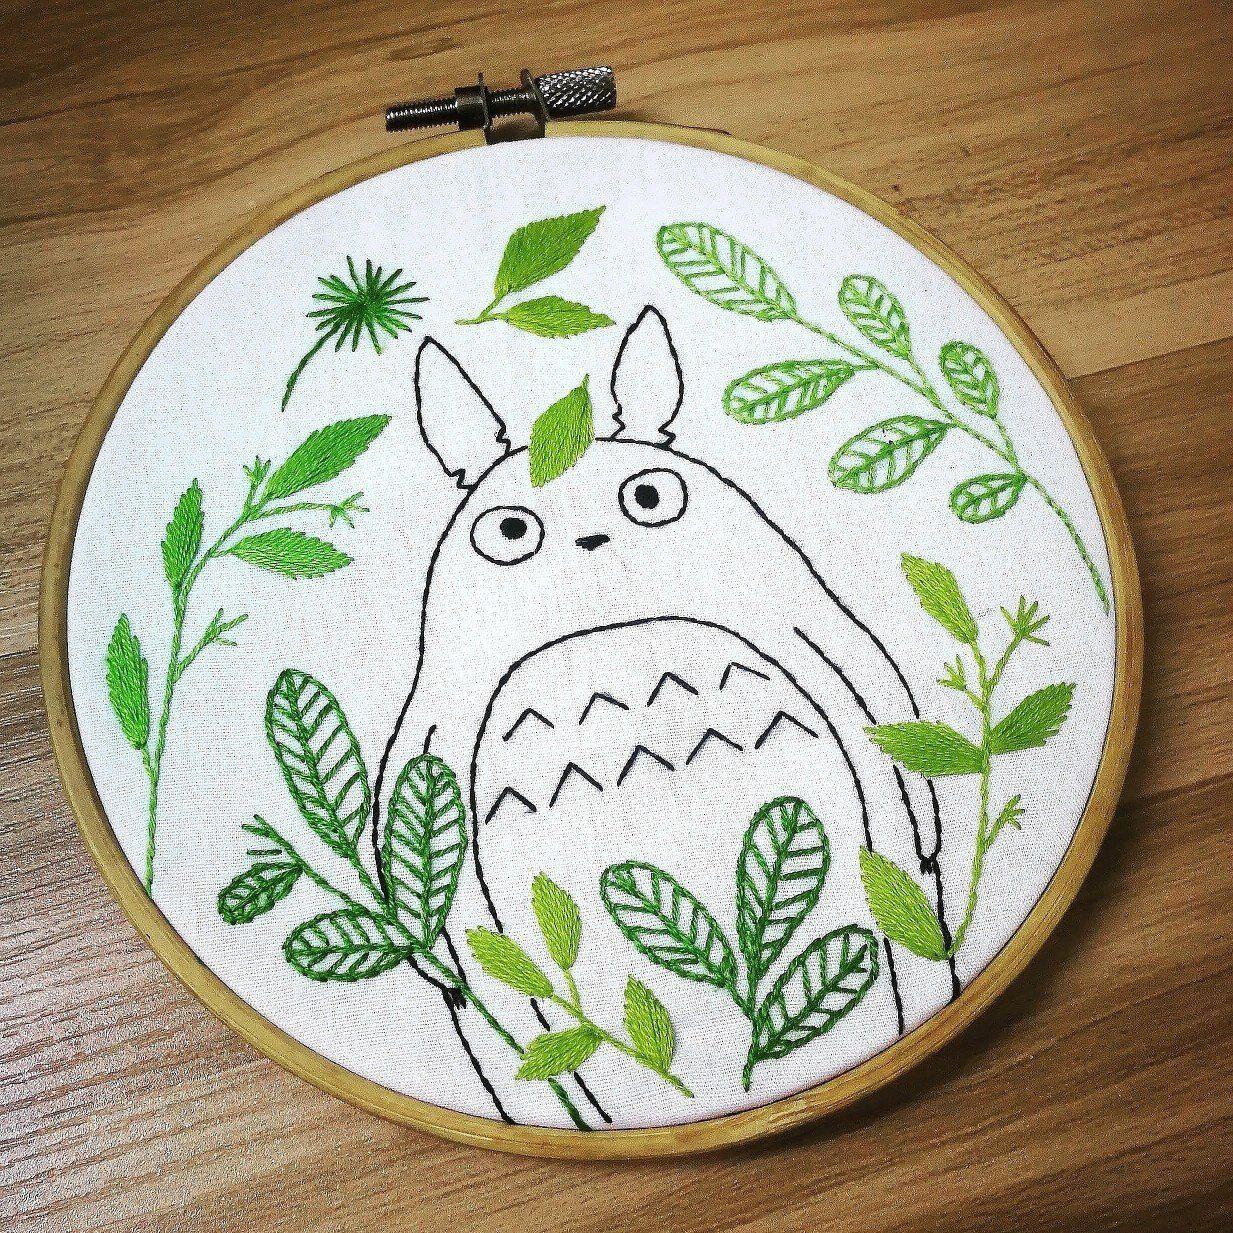 Totoro Embroidery-My Neighbor Ghibli Studio Totoro Hand Embroidery Totoro Pattern Blue Flower Nursery Art #embroiderypatternsbeginner